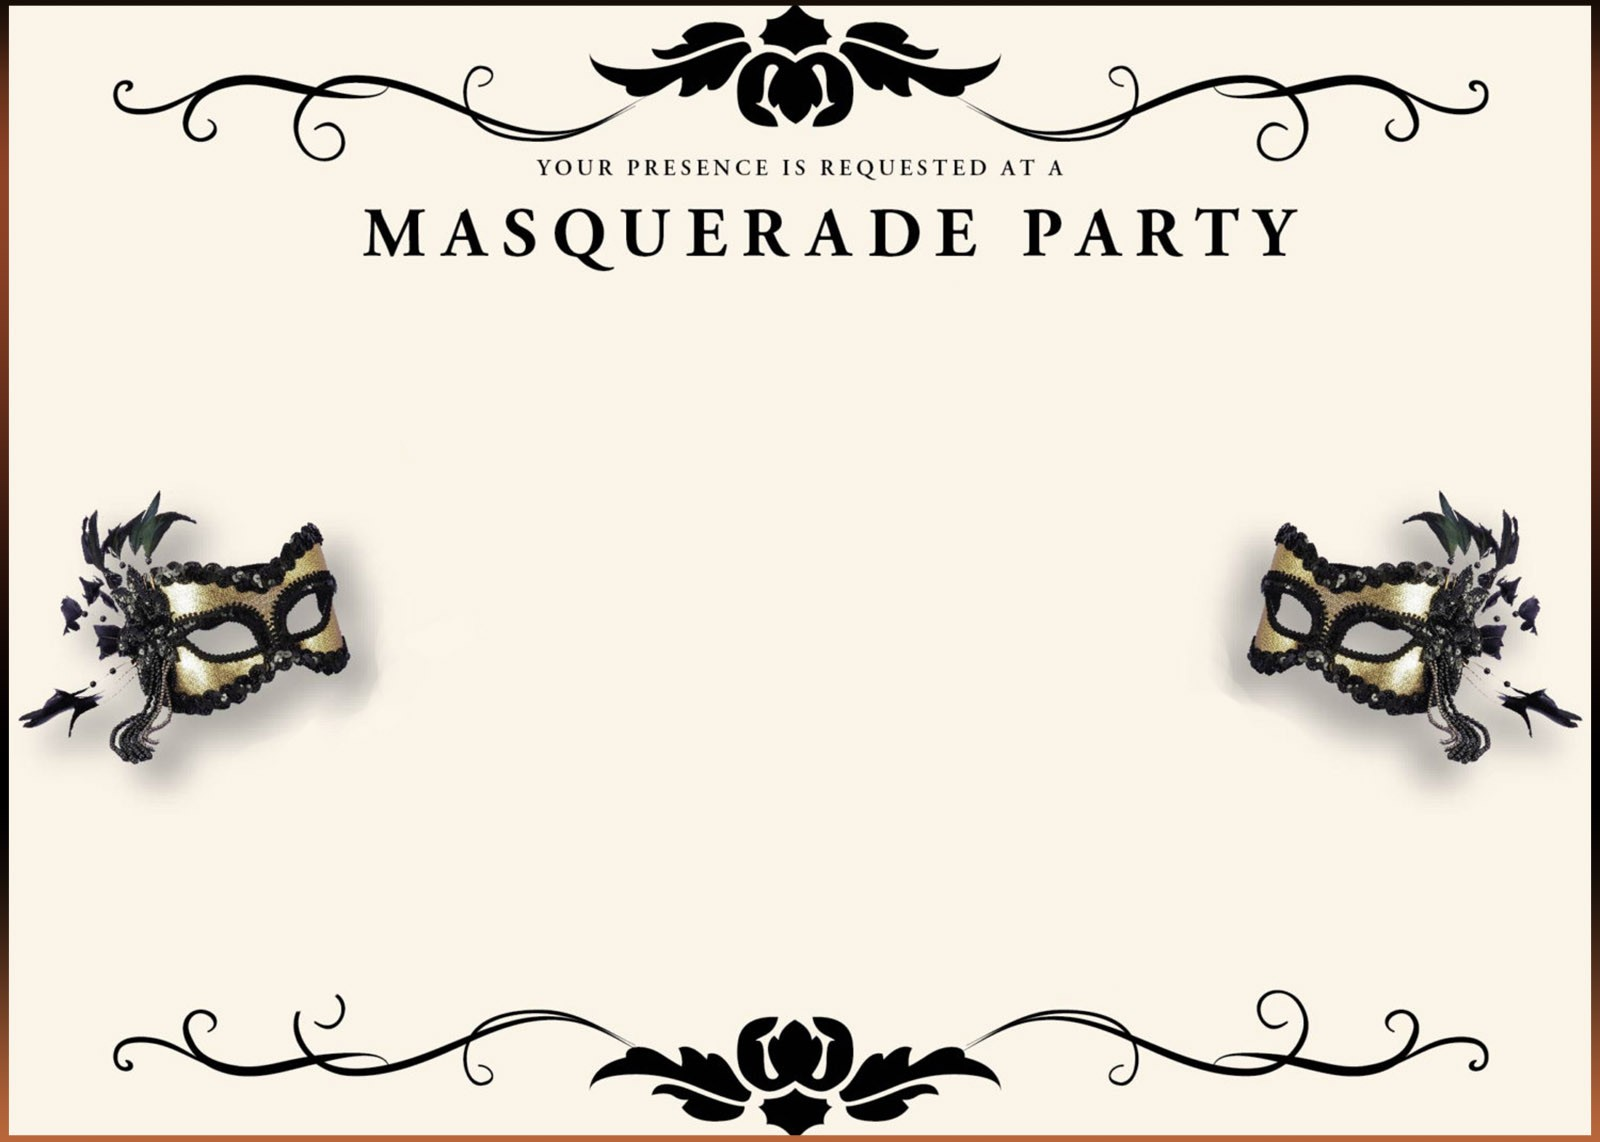 Free printable masquerade invitation templates for Masquerade ball masks templates